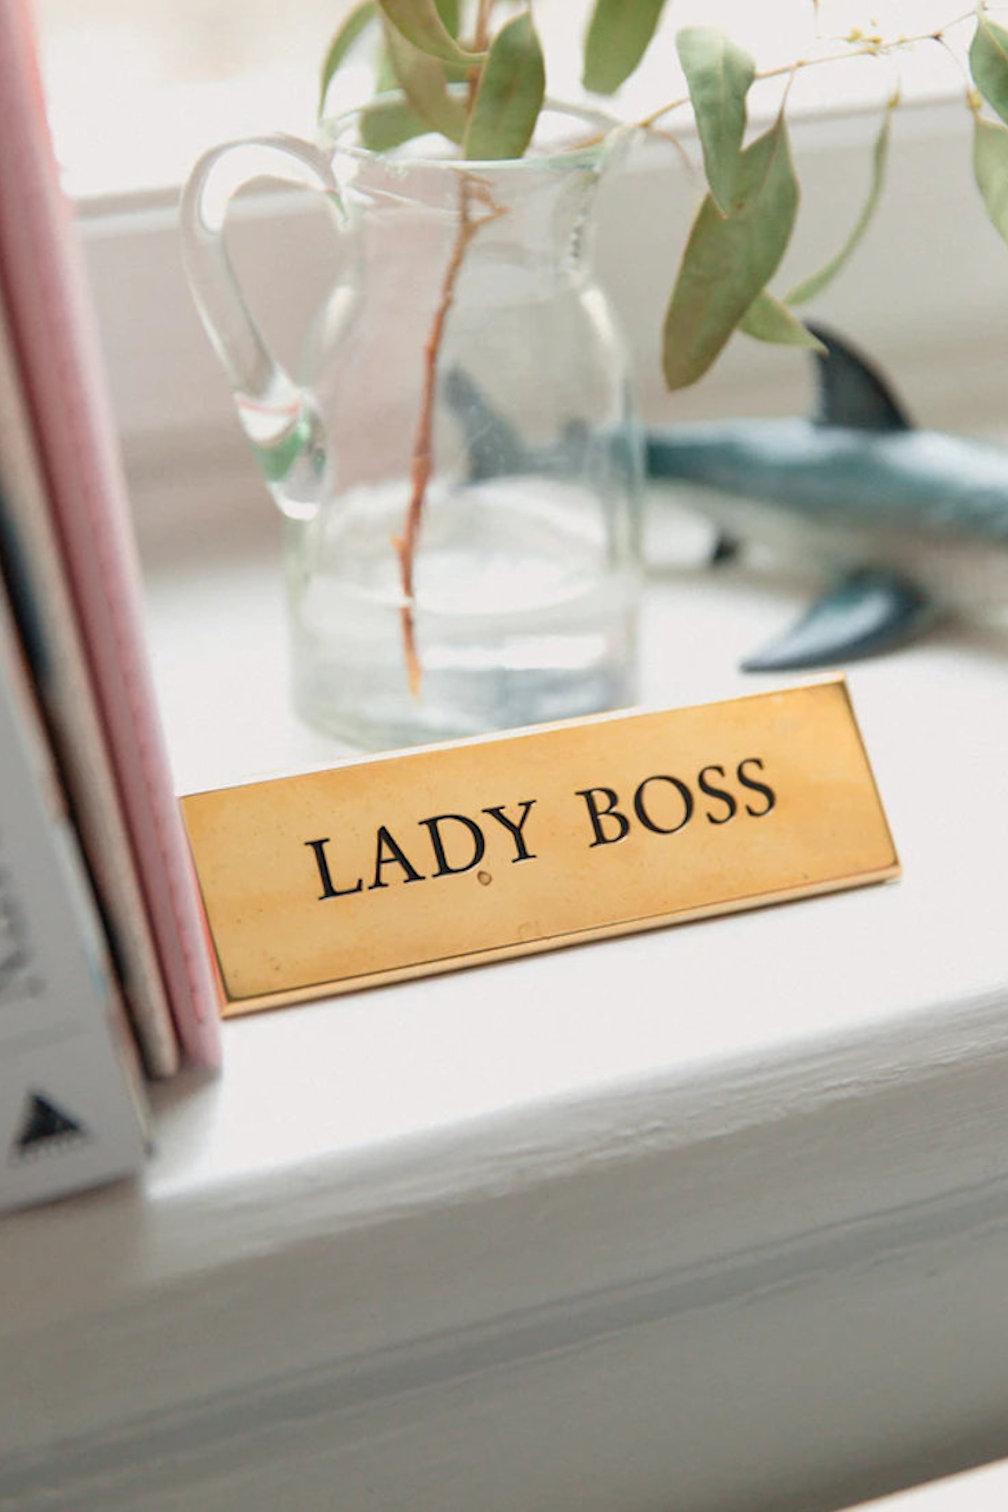 Join the club, word ook een MLM girlboss